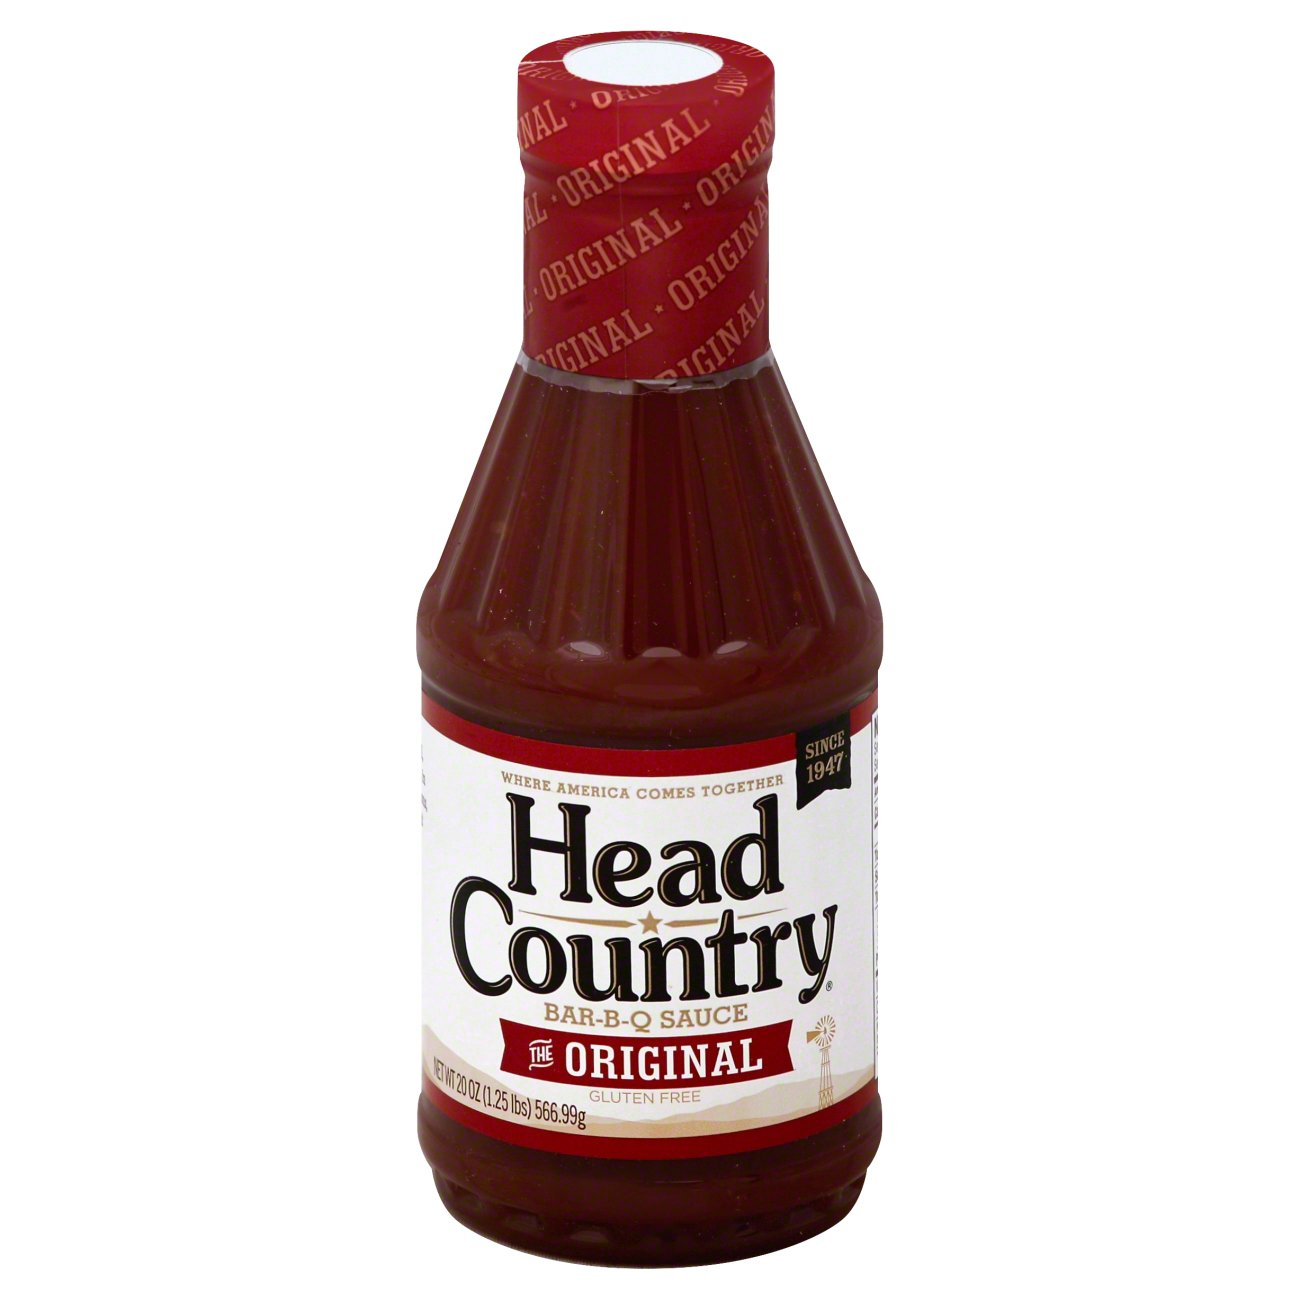 Head Country The Original Bar-B-Q Sauce - Shop BBQ Sauce at HEB